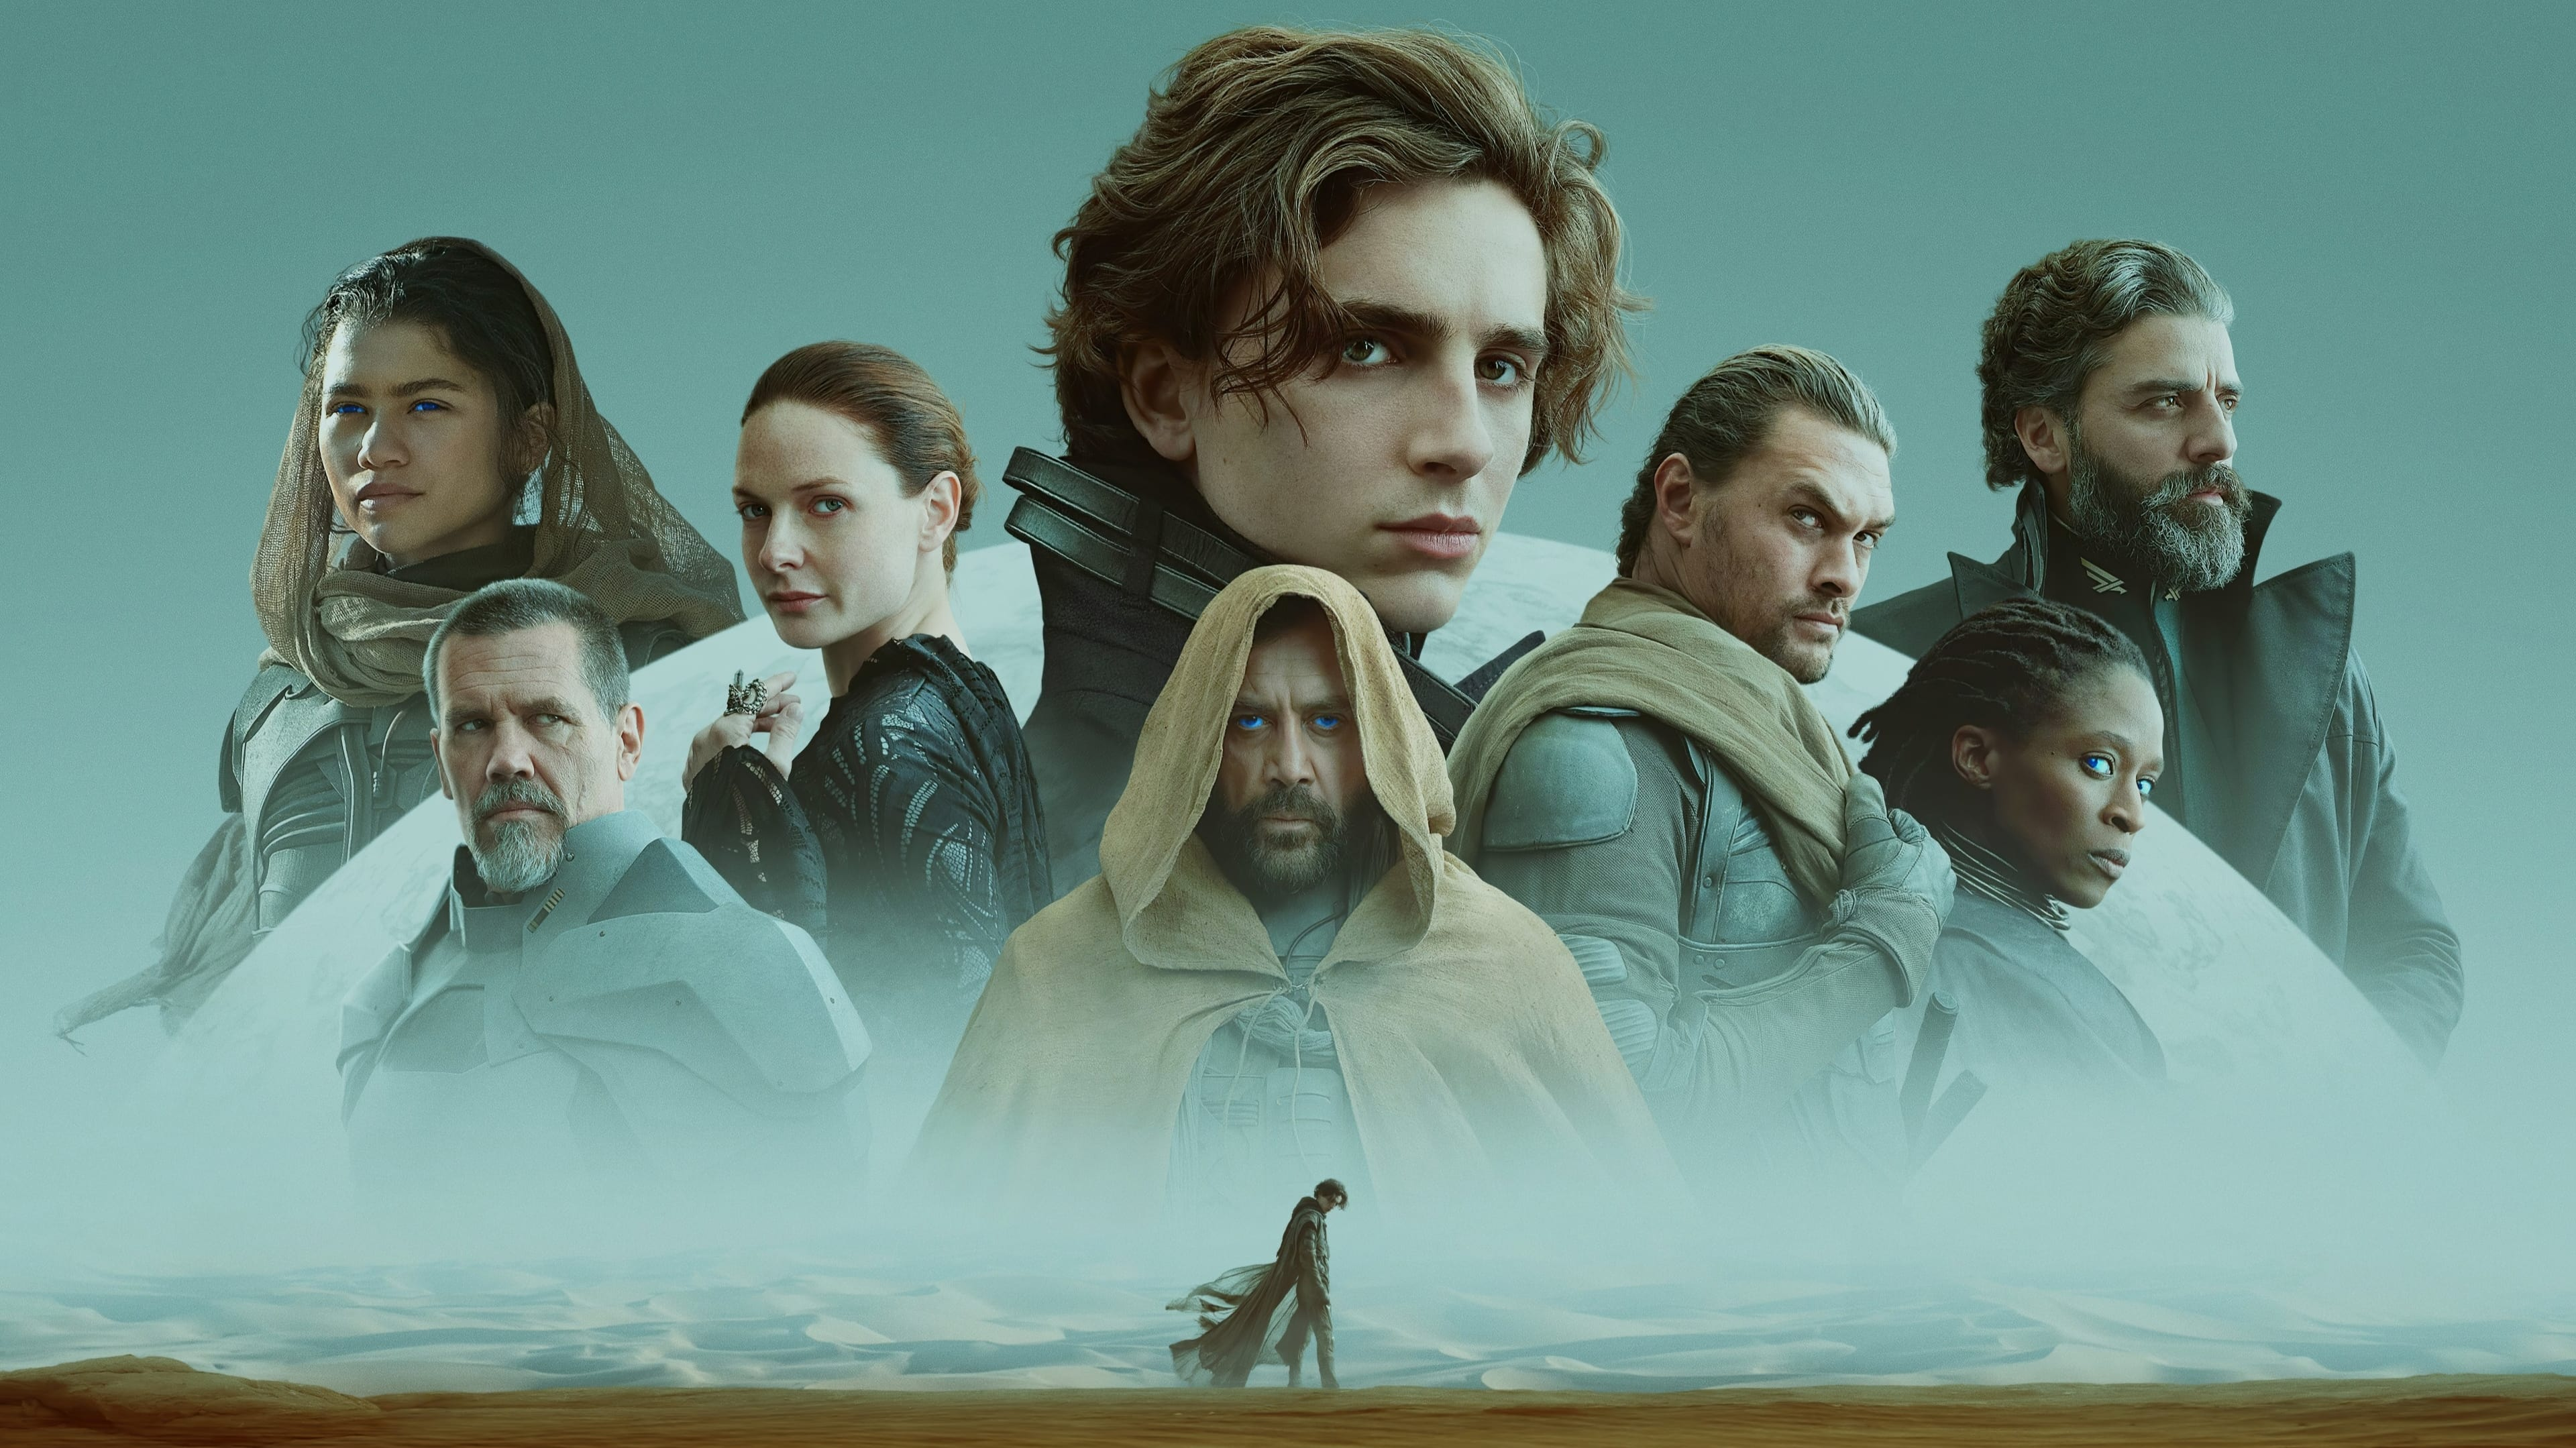 123movies Dune 2021 Full Online Watch Free Download Here Cloudschool